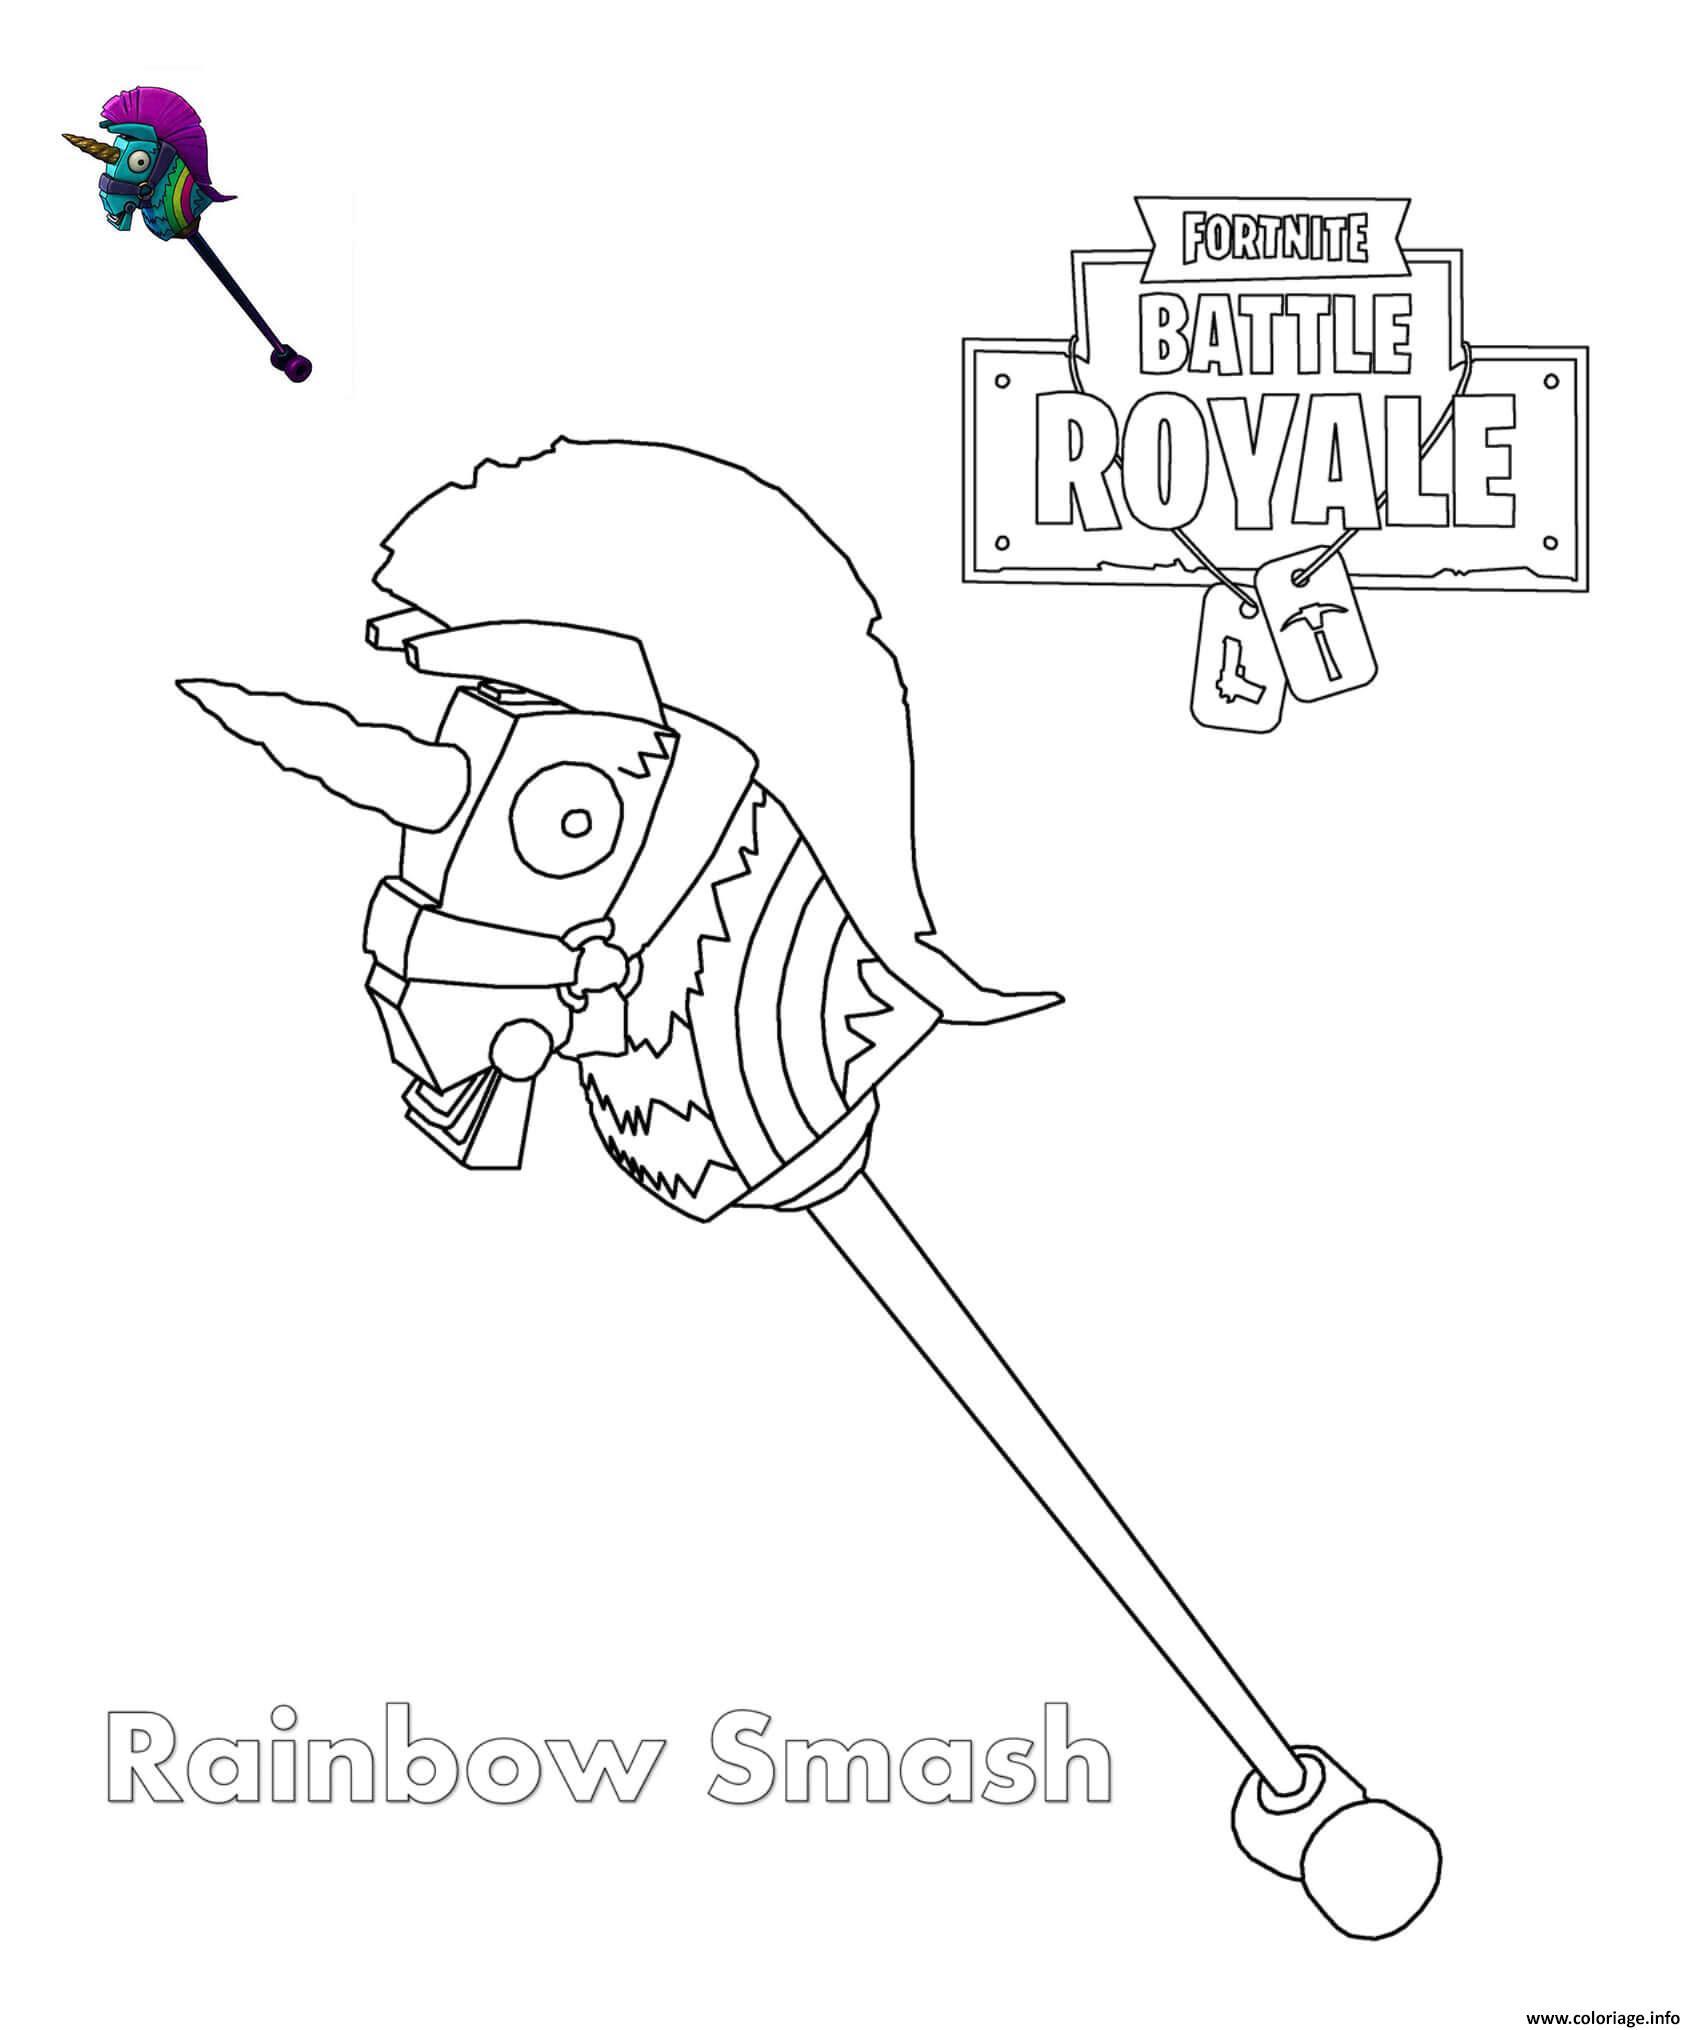 Coloriage Rainbow Smash Fortnite Jecoloriecom